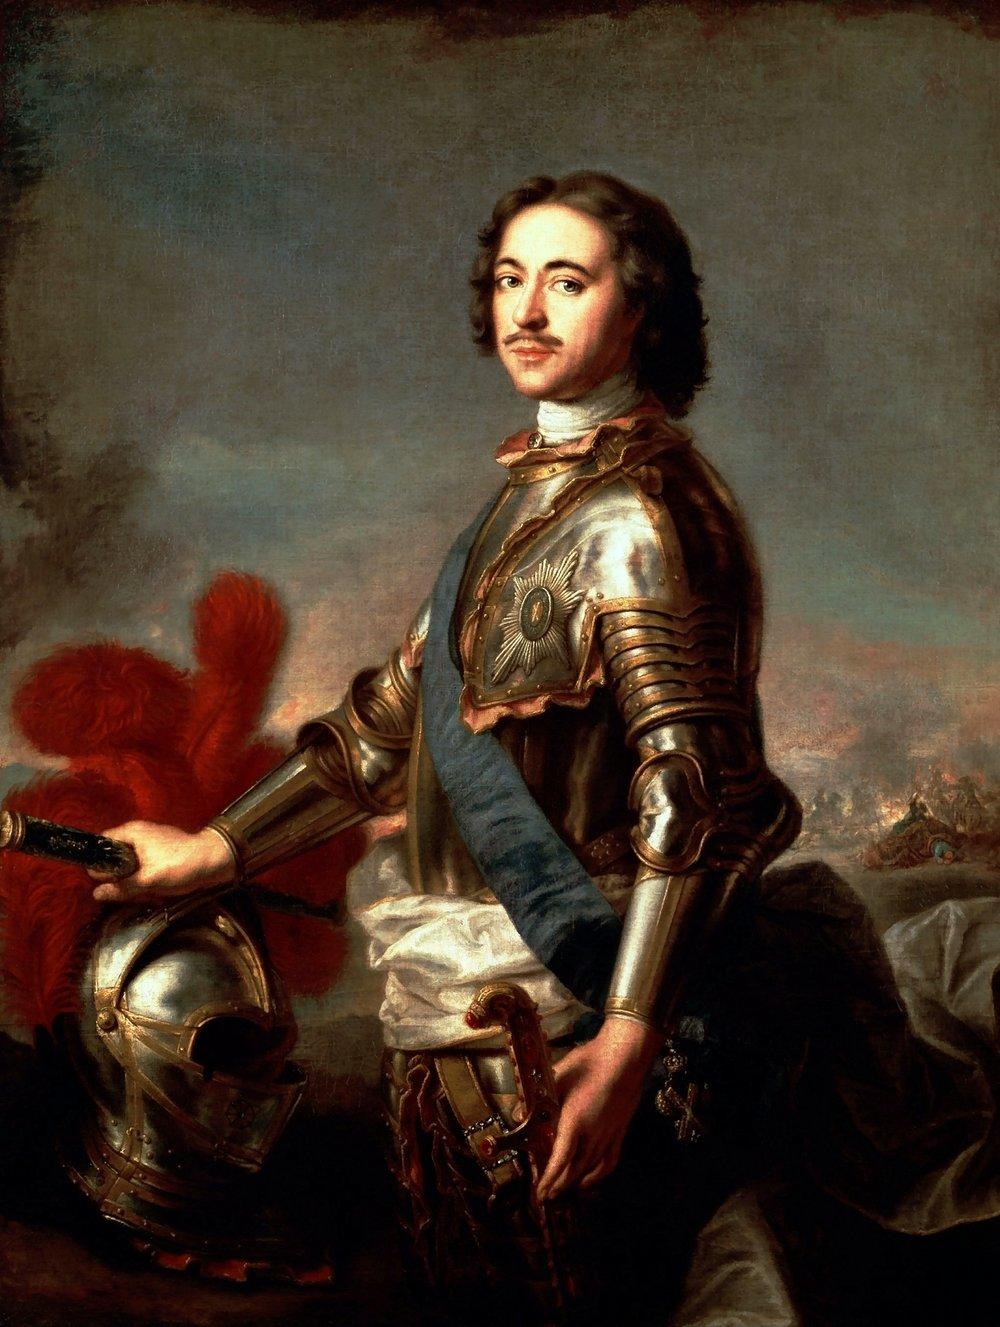 J.-M. Nattier, Portrait of Peter the Great, 1717